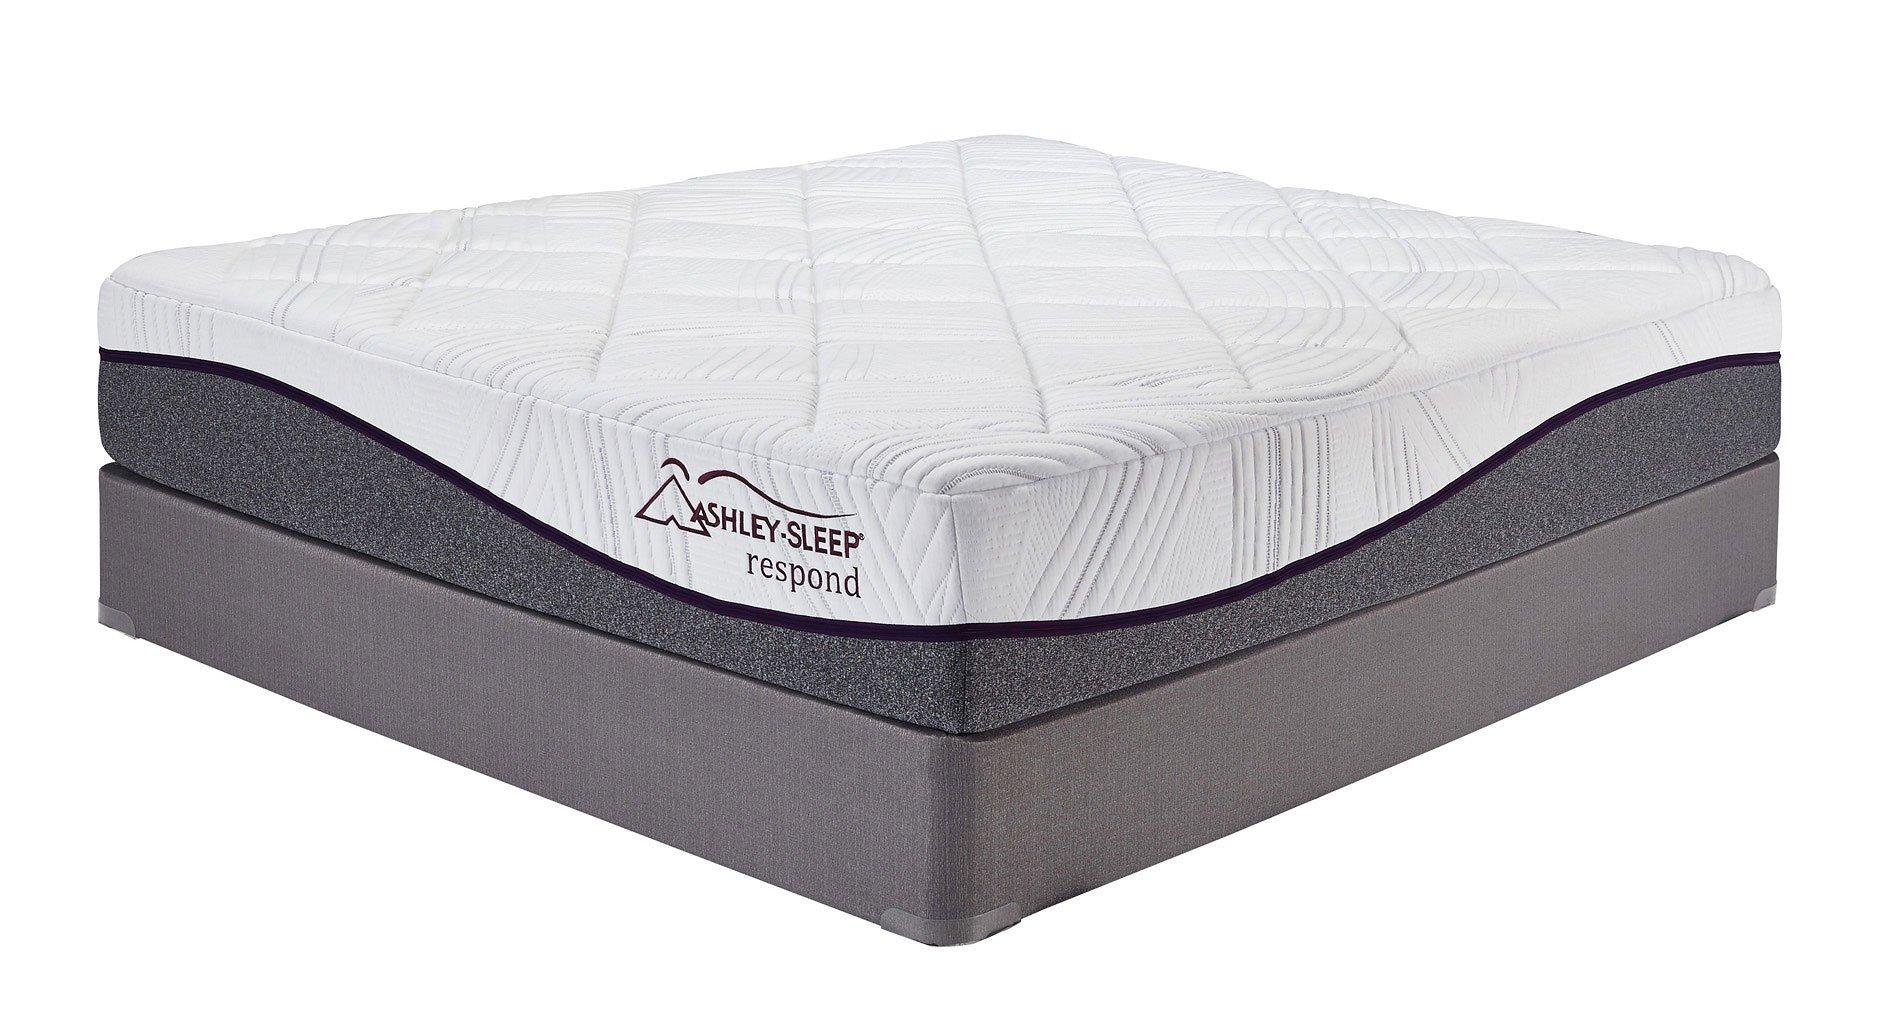 12 Inch Respond Series Memory Foam Queen Mattress By Ashley Sleep